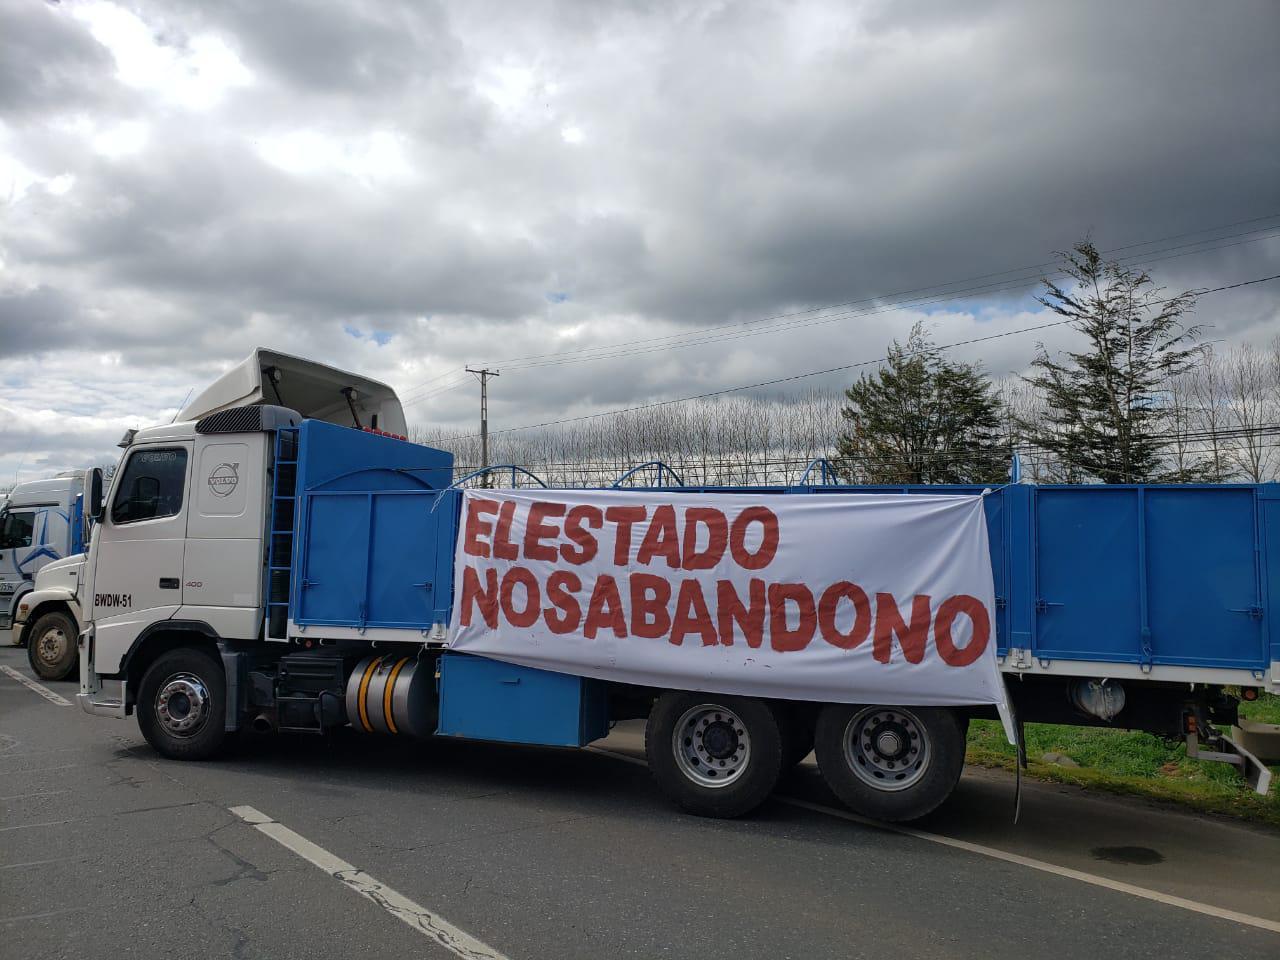 Camiones Pillanlelbun 5